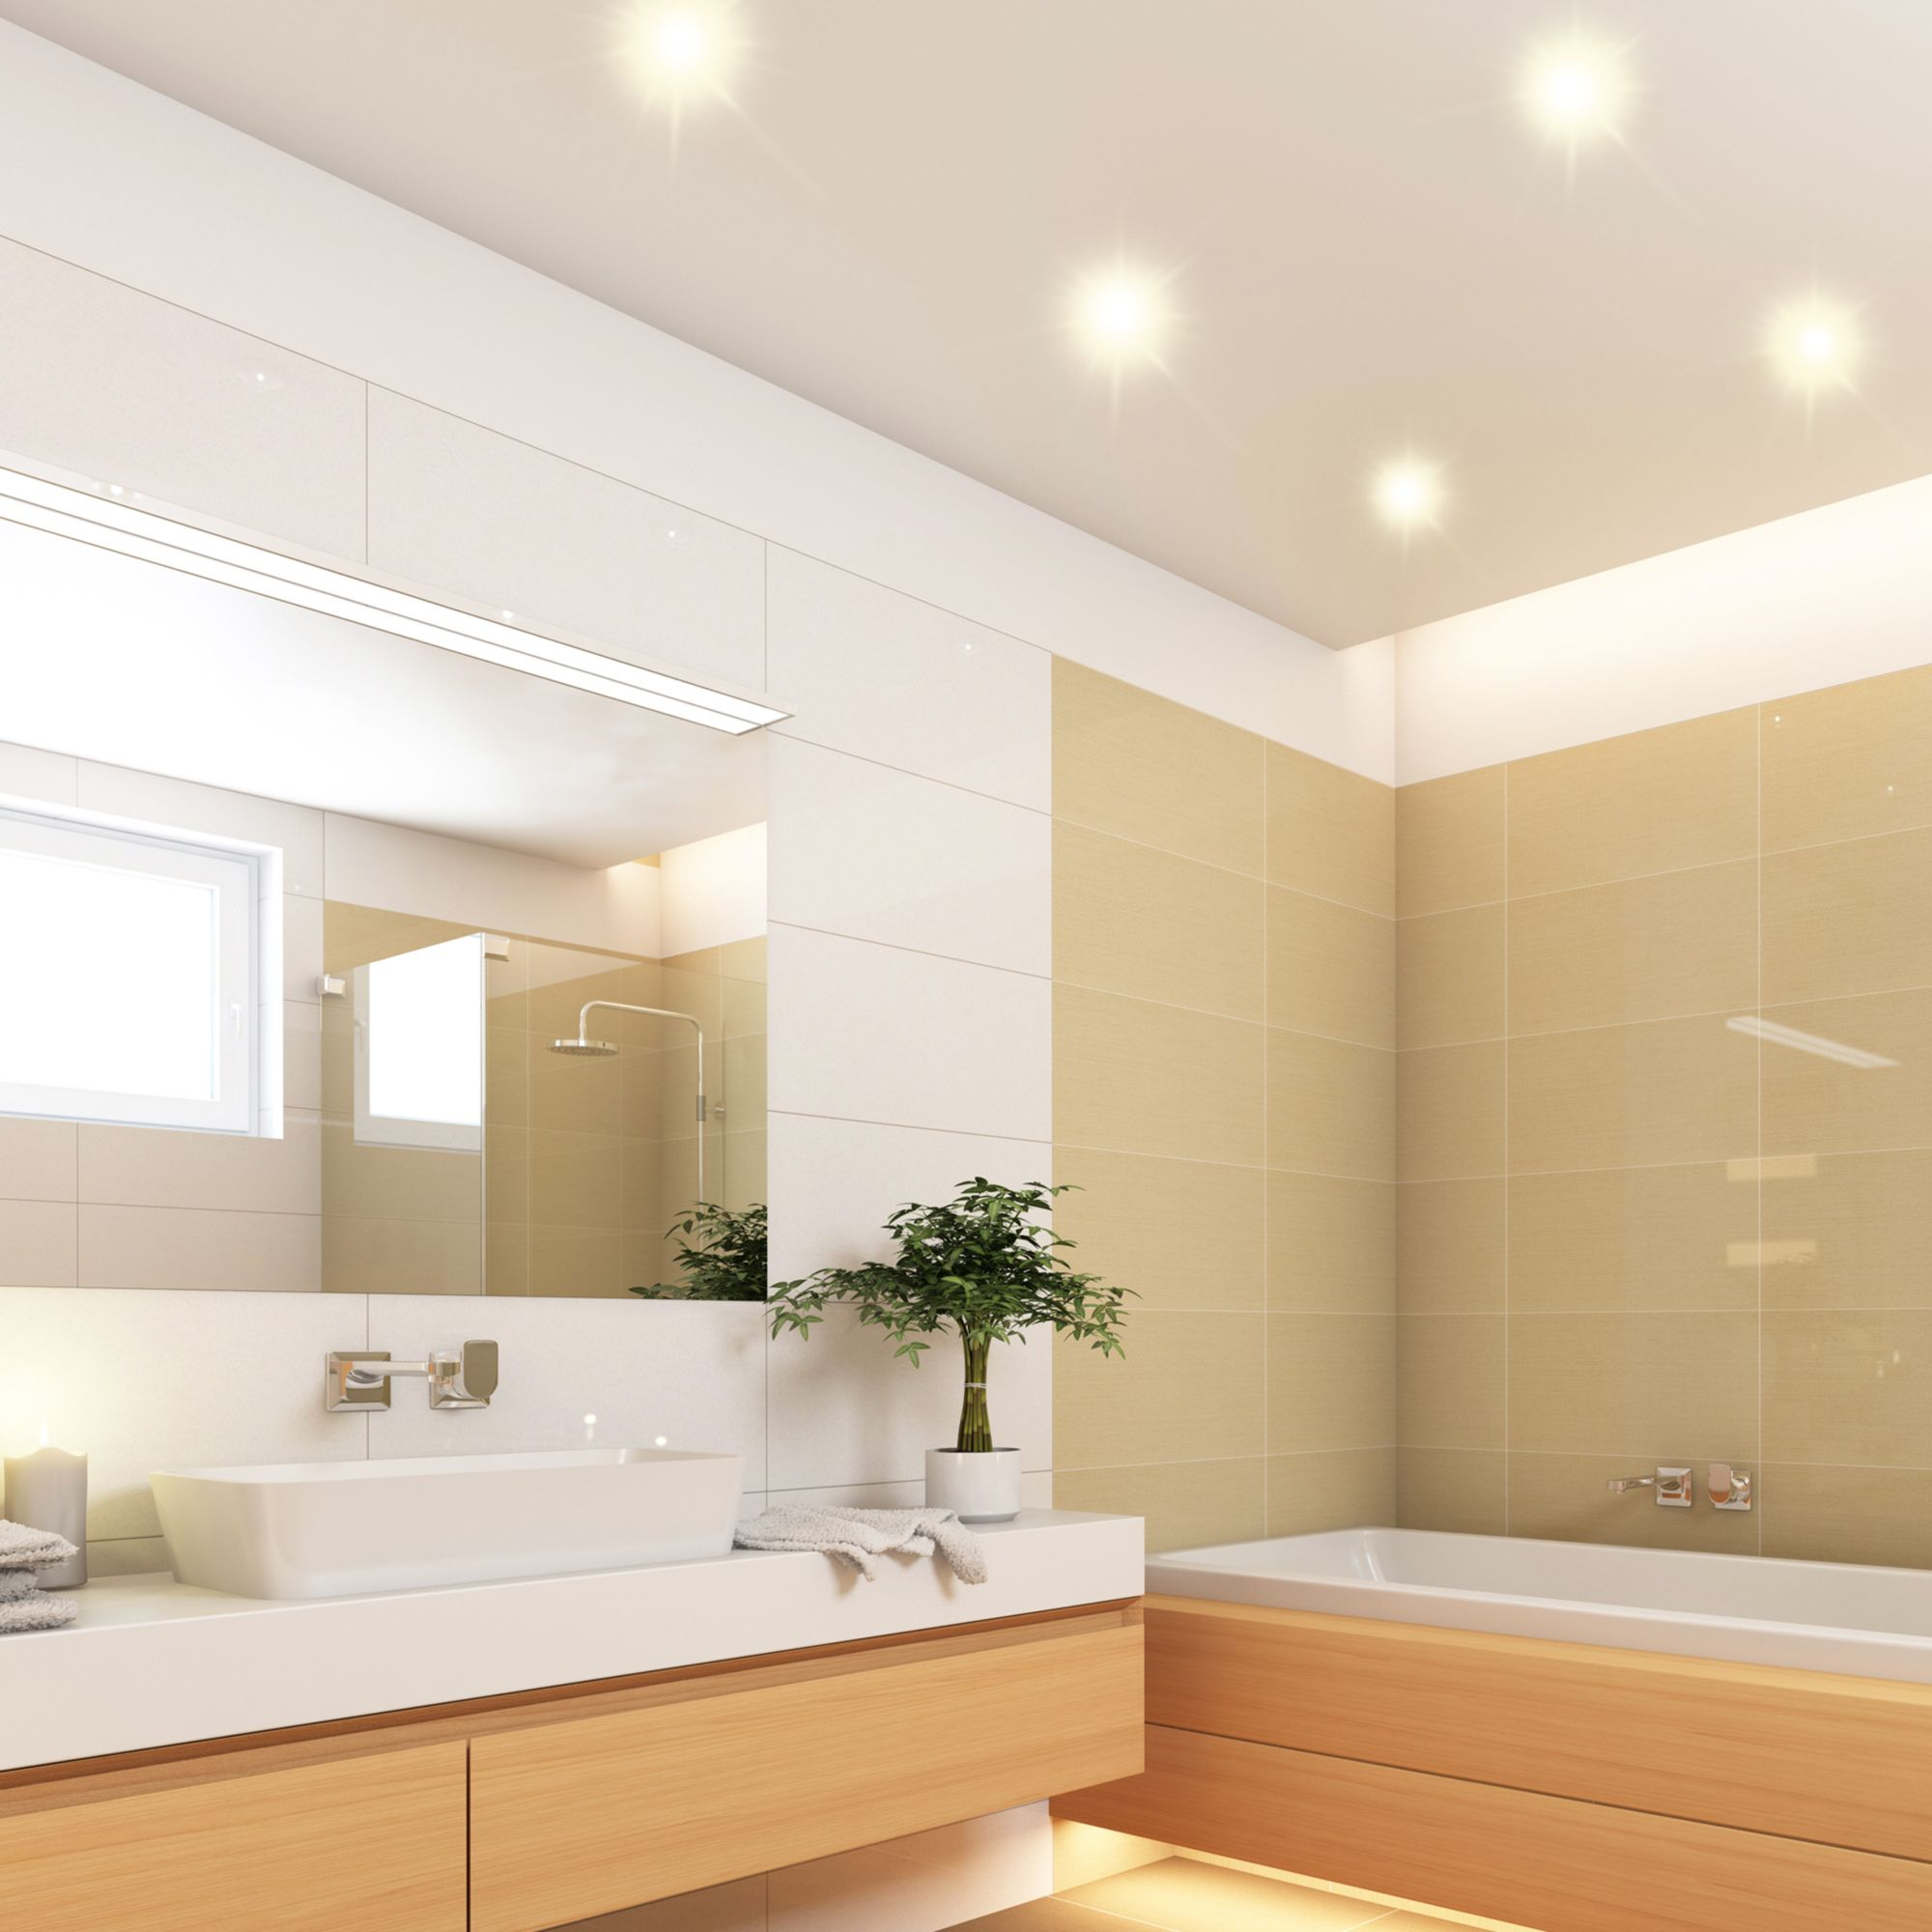 Deckenbeleuchtung Fur Das Bad Led Einbaustrahler Einbaustrahler Led Einbaustrahler Deckenbeleuchtung